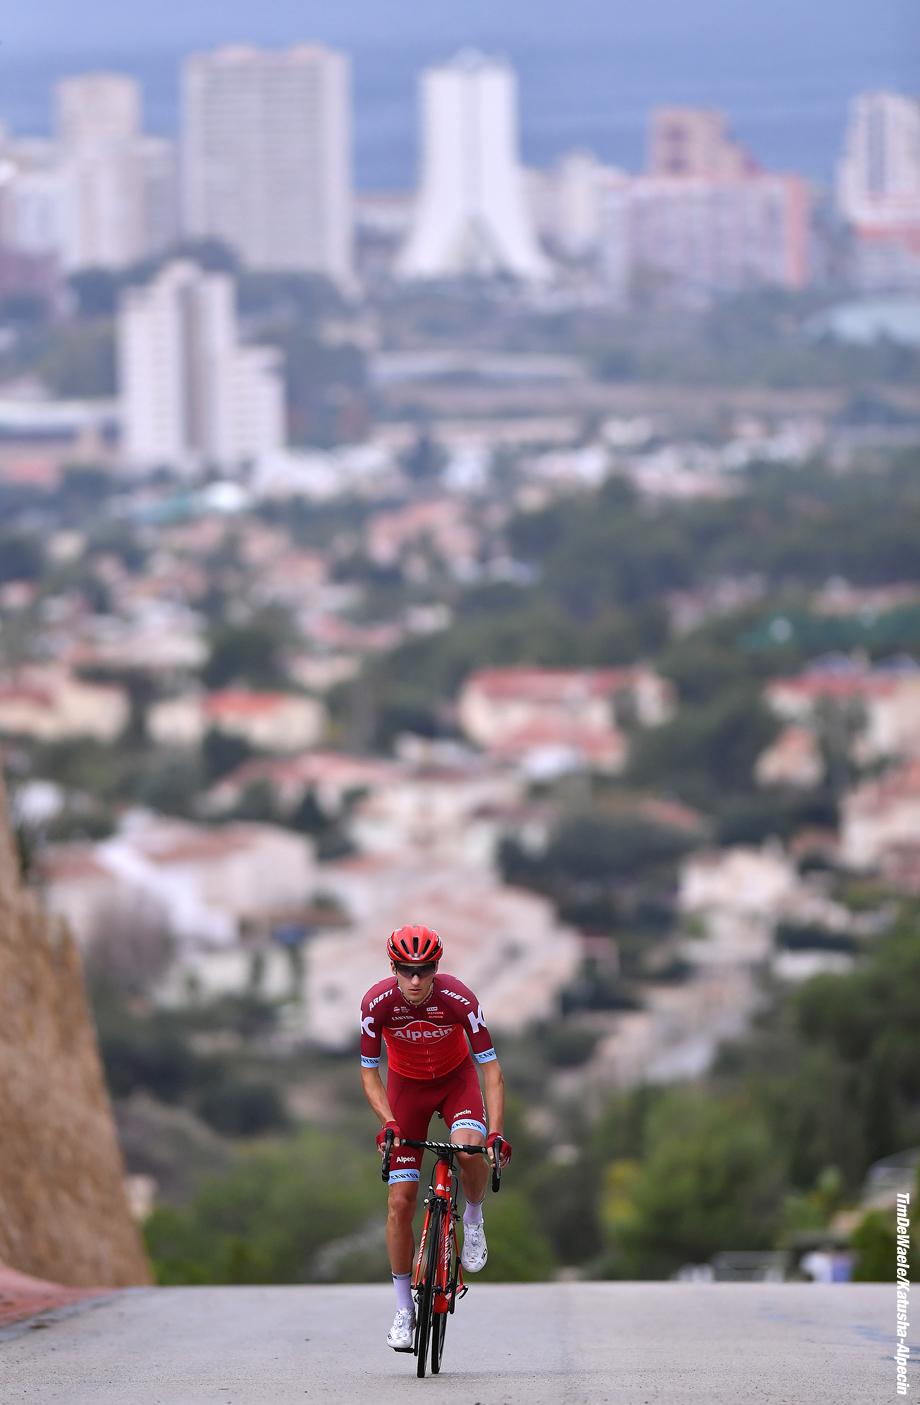 Cycling: Team Katusha Alpecin 2017 Sven Erik BYSTROM (NOR)/ Team Katusha Alpecin (SUI)/ ©Tim De Waele